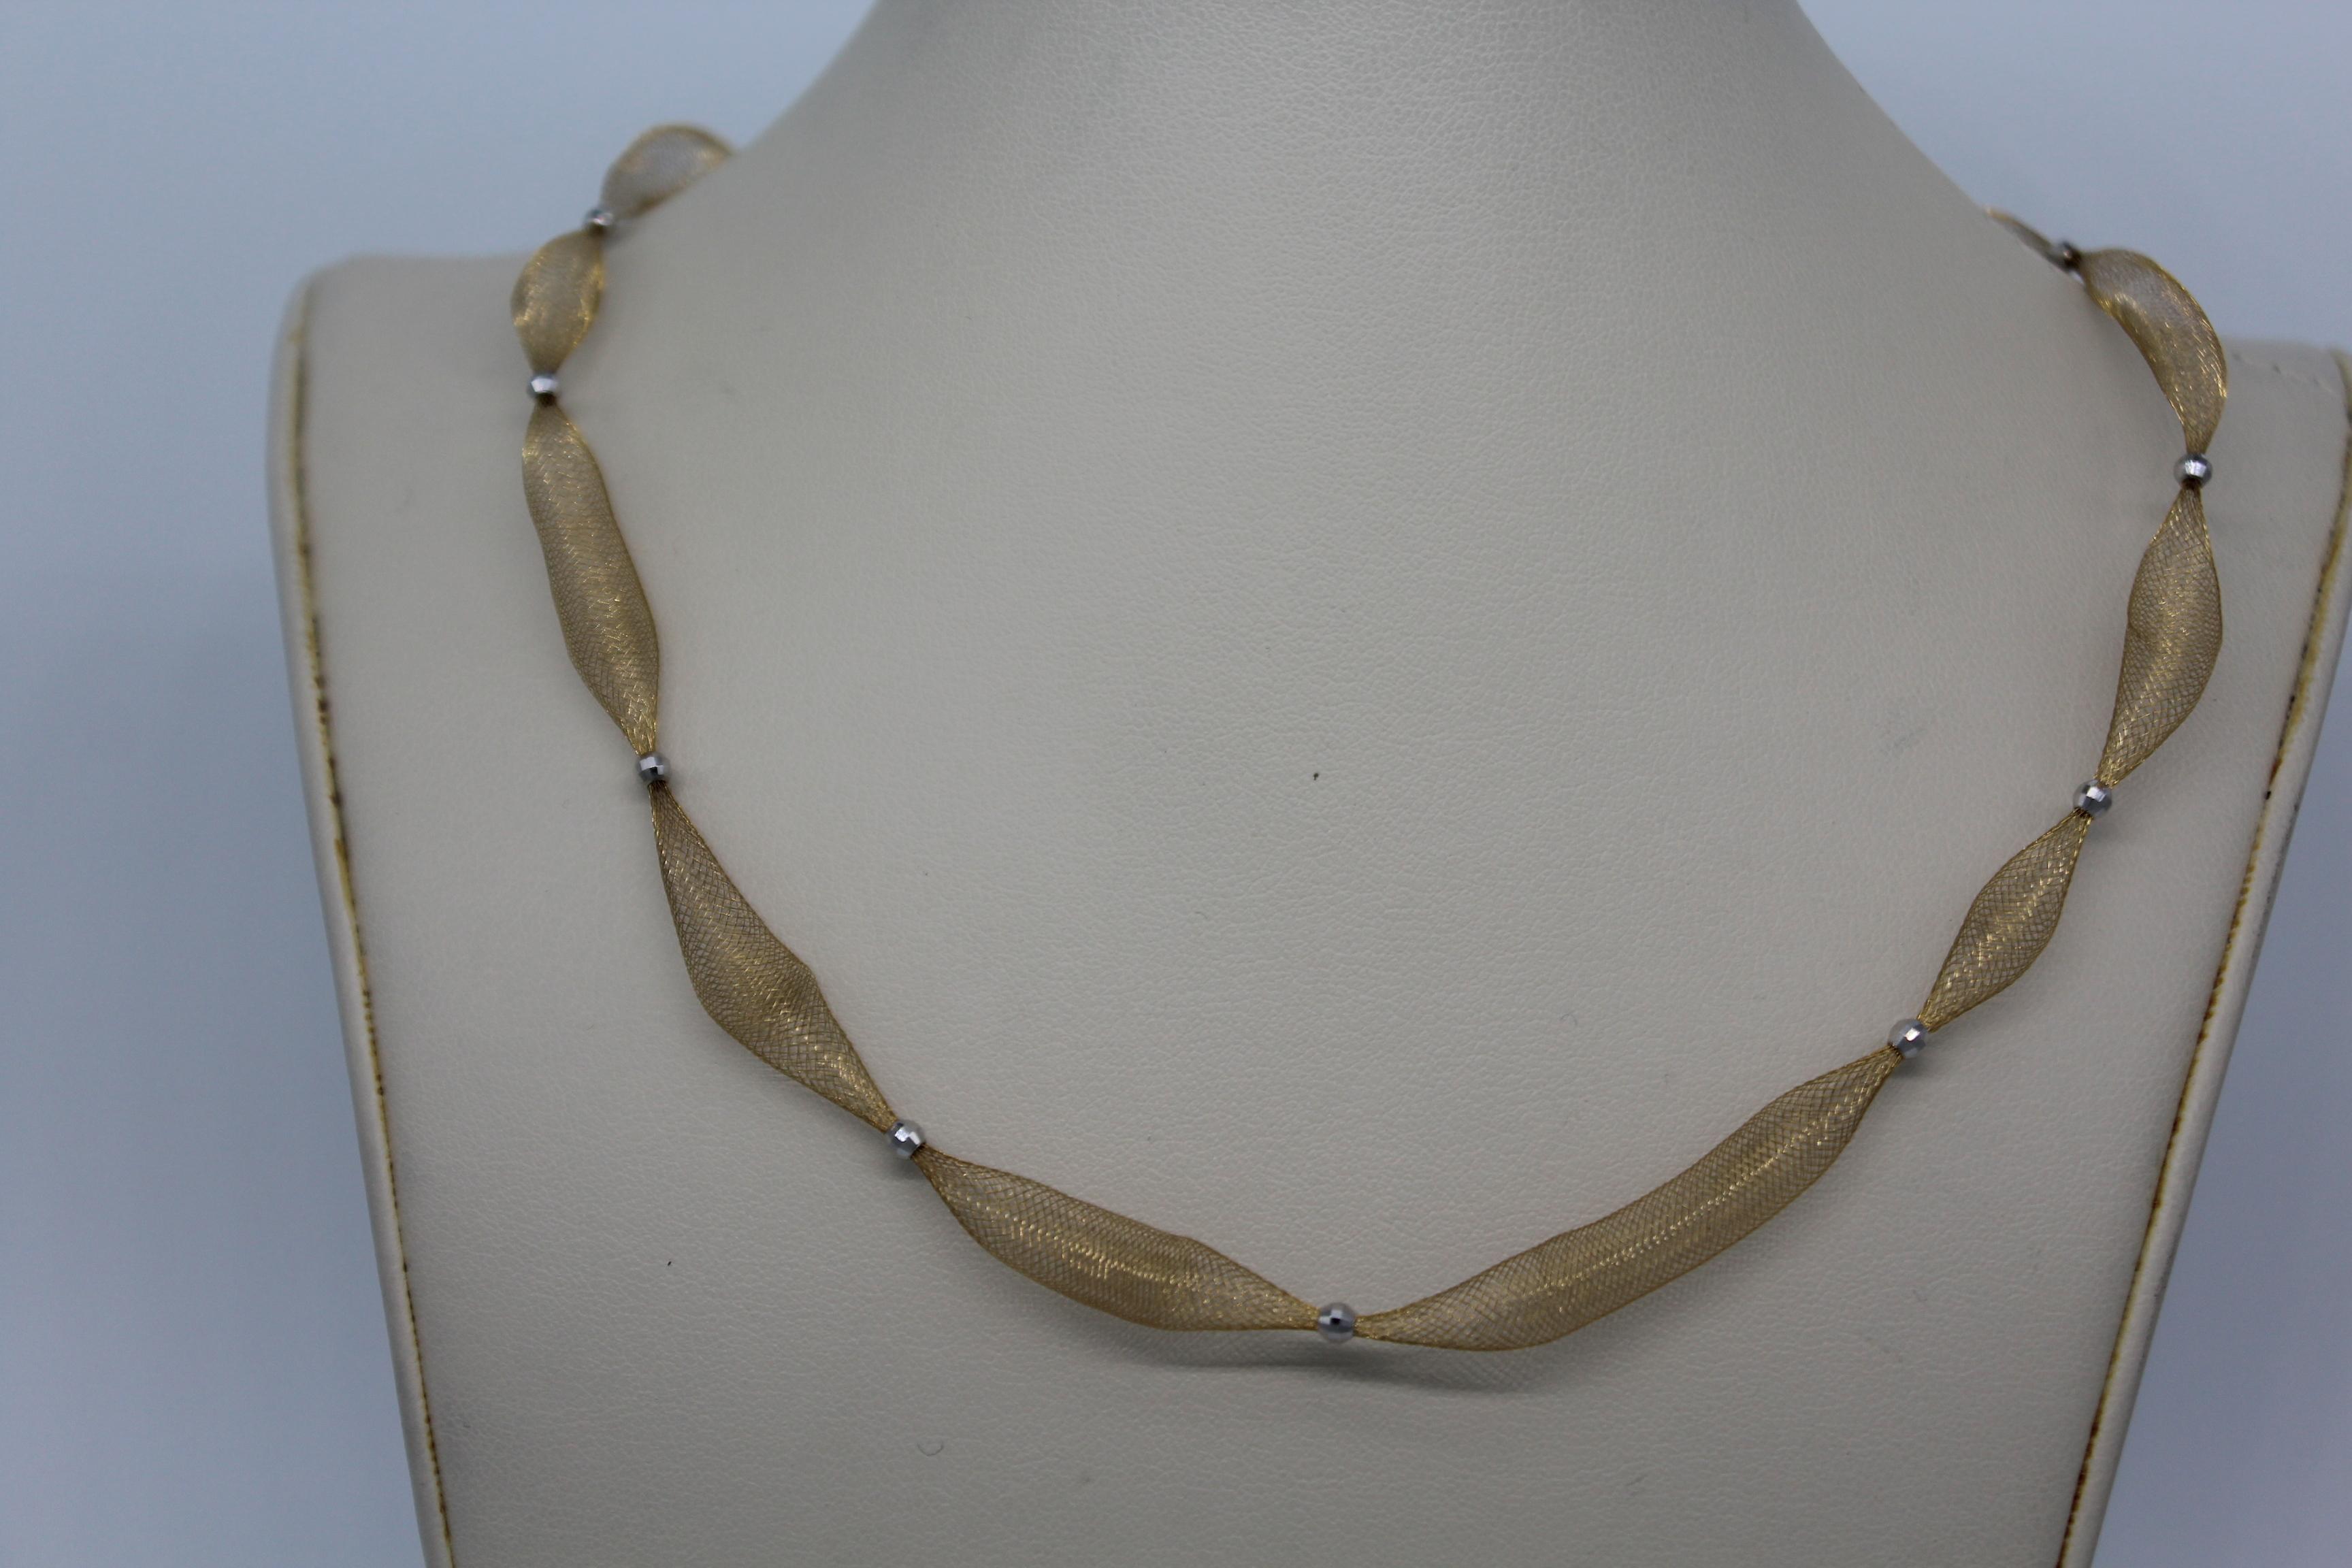 Unique & Stunning Necklace